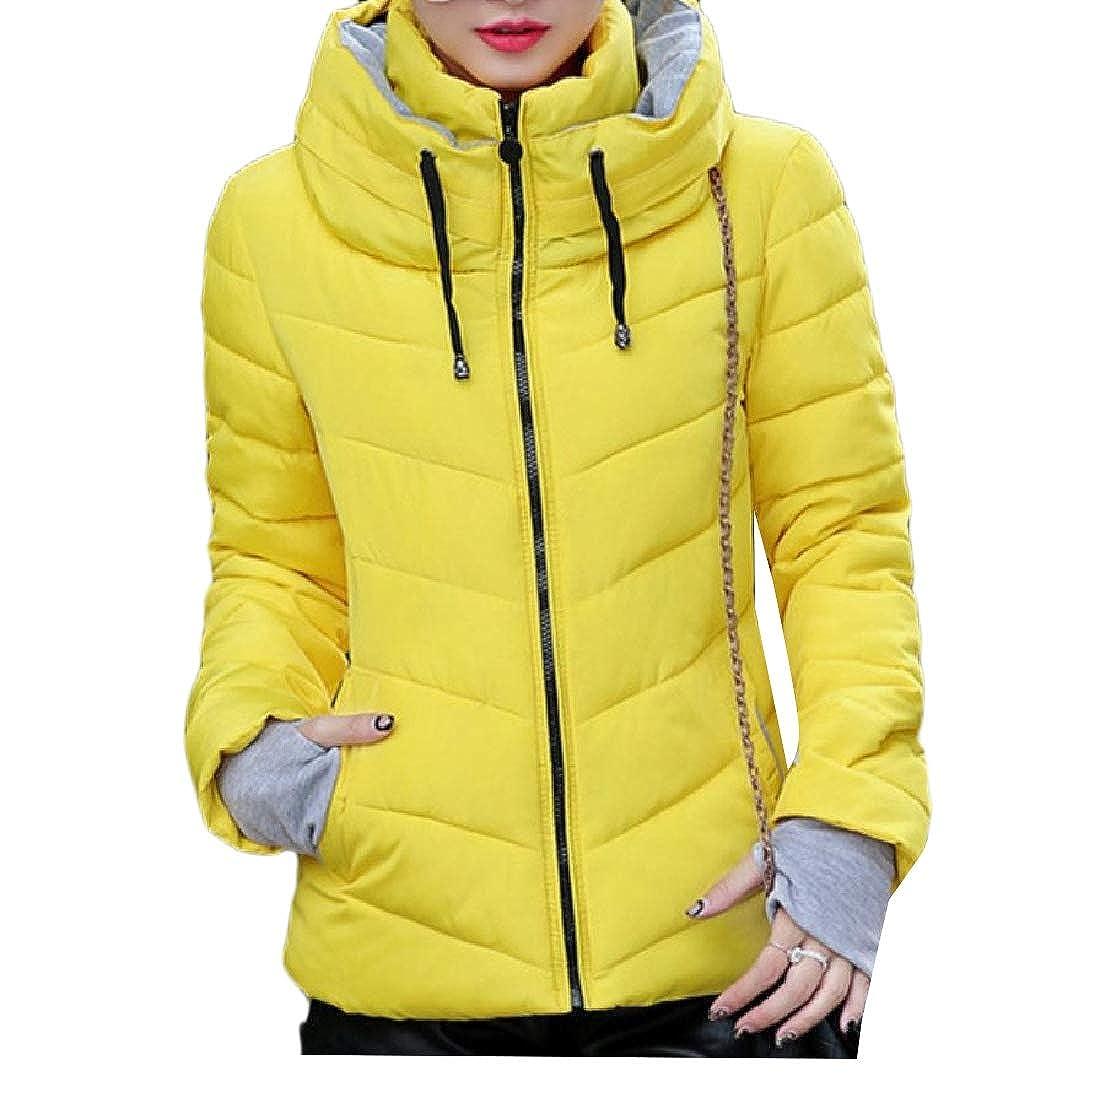 YUNY Womens Outwear Puffer Packable Light Weight Thicken Down Coat Yellow 2XL